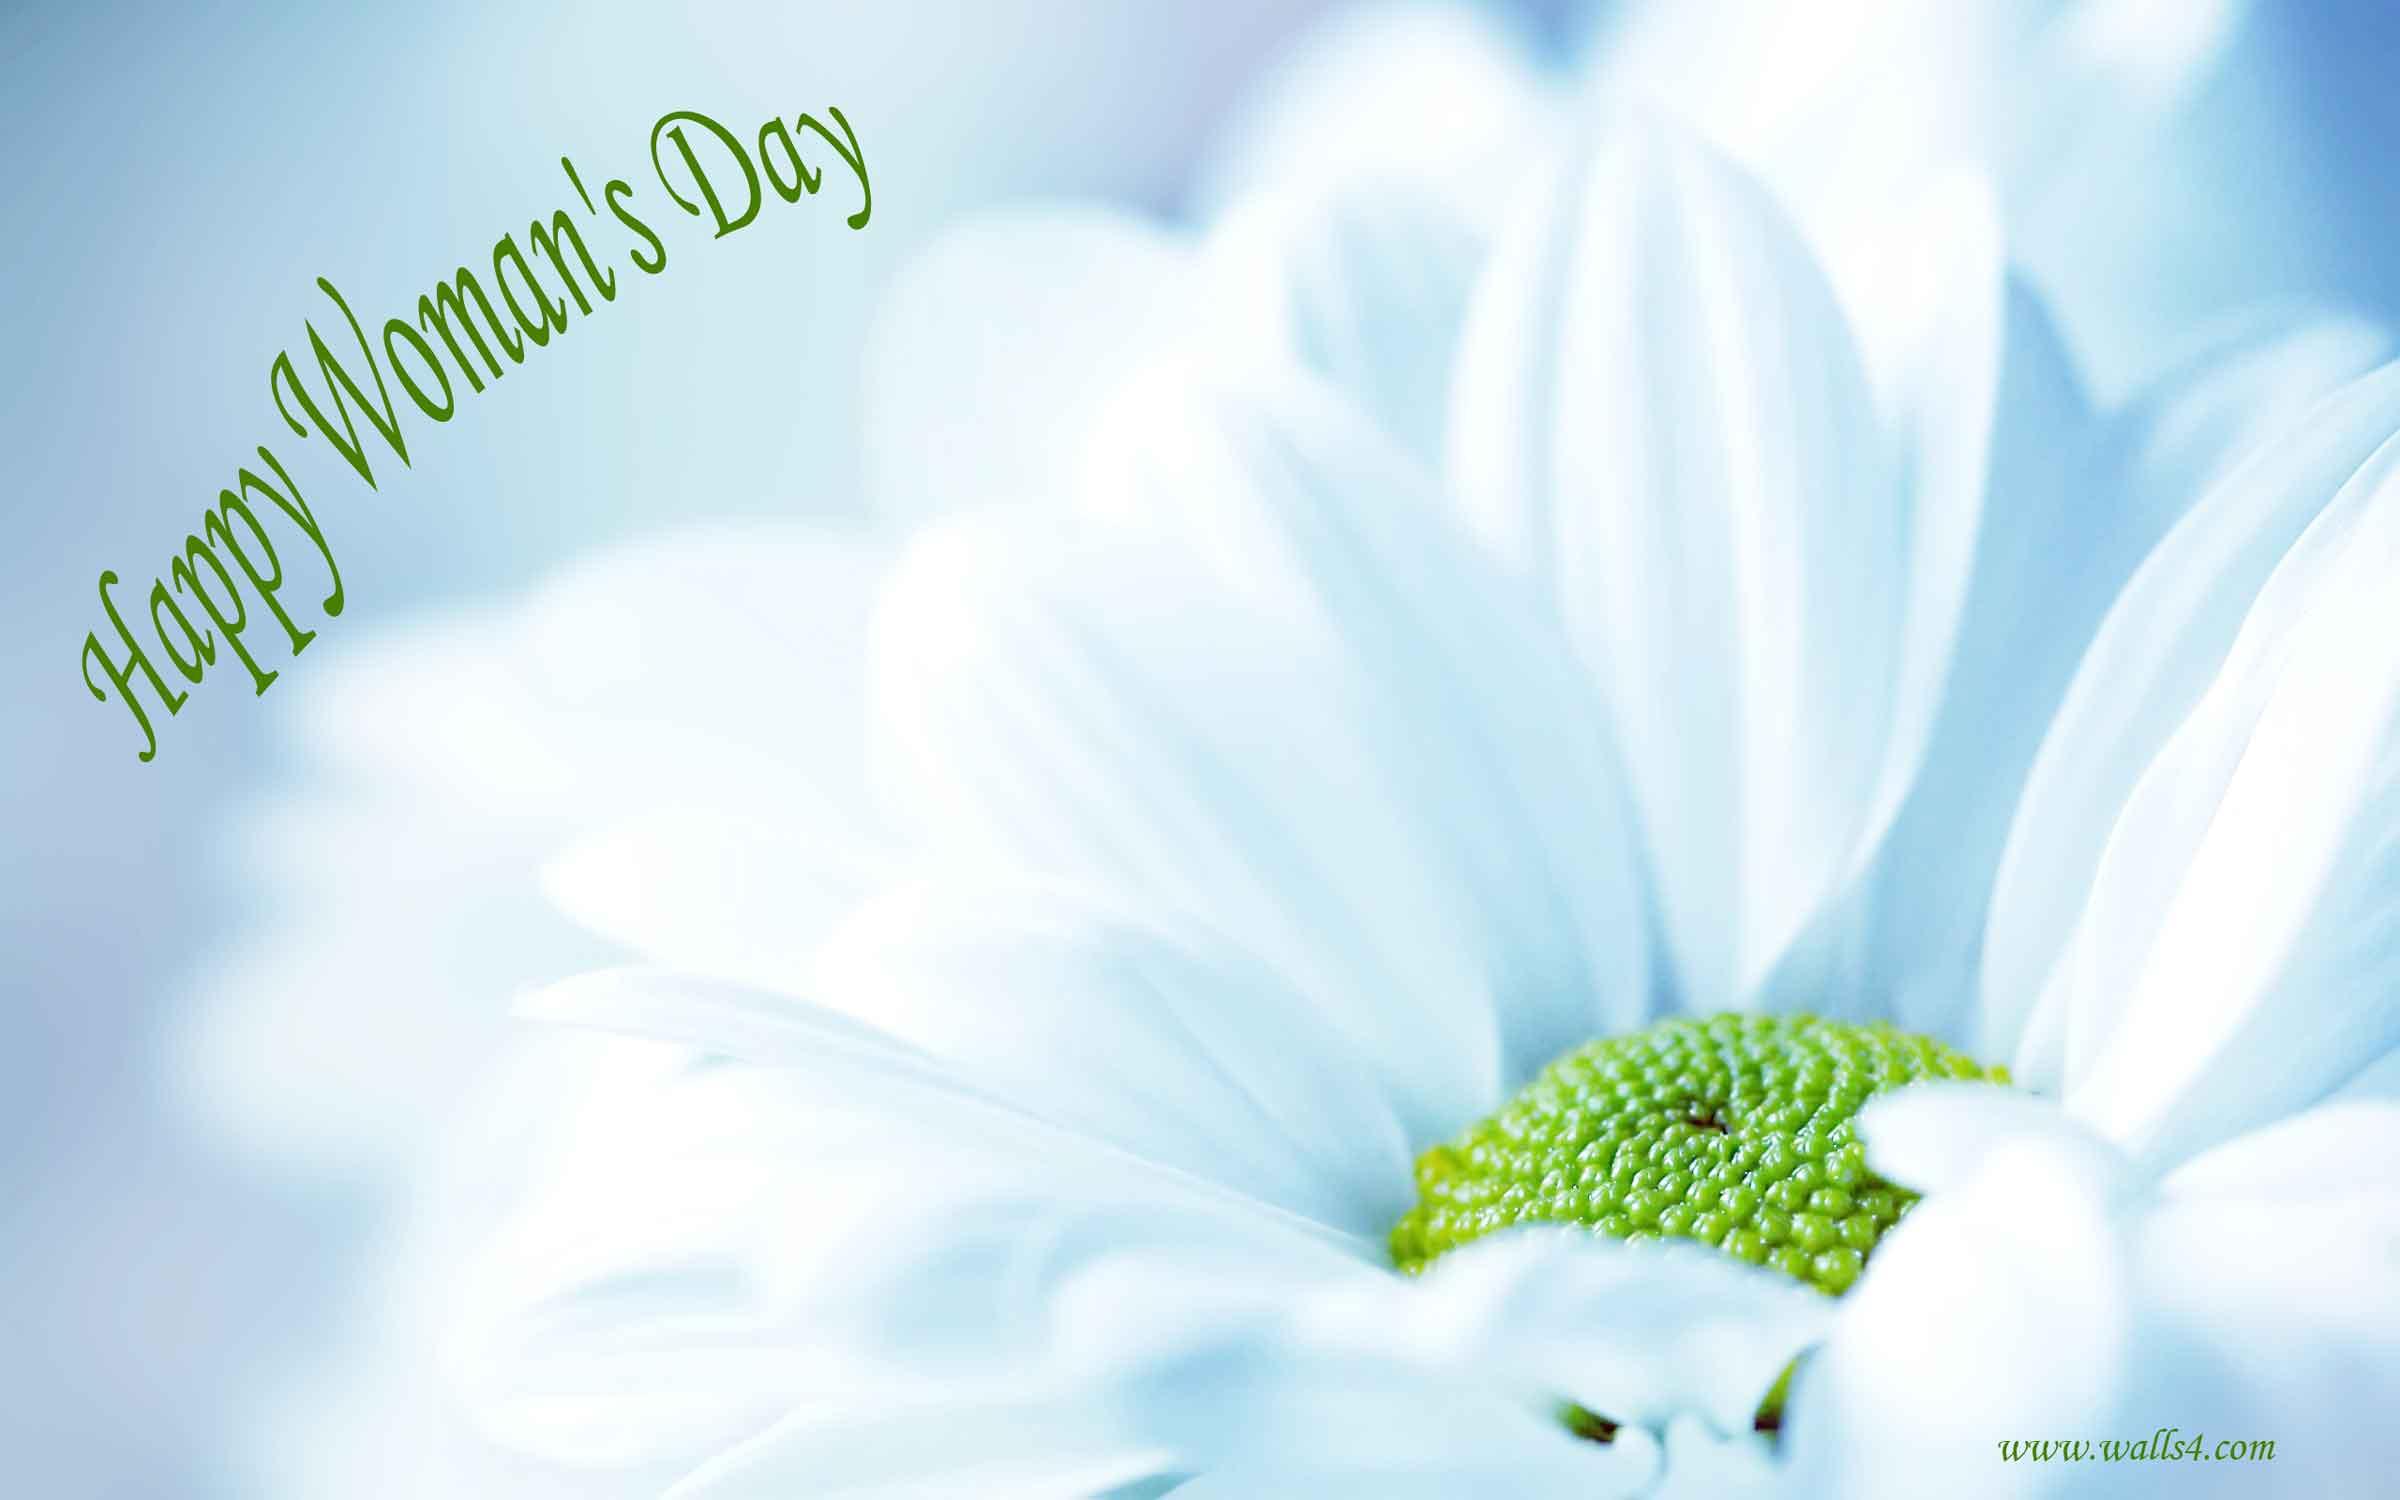 International Woman's Day: Woman's Day